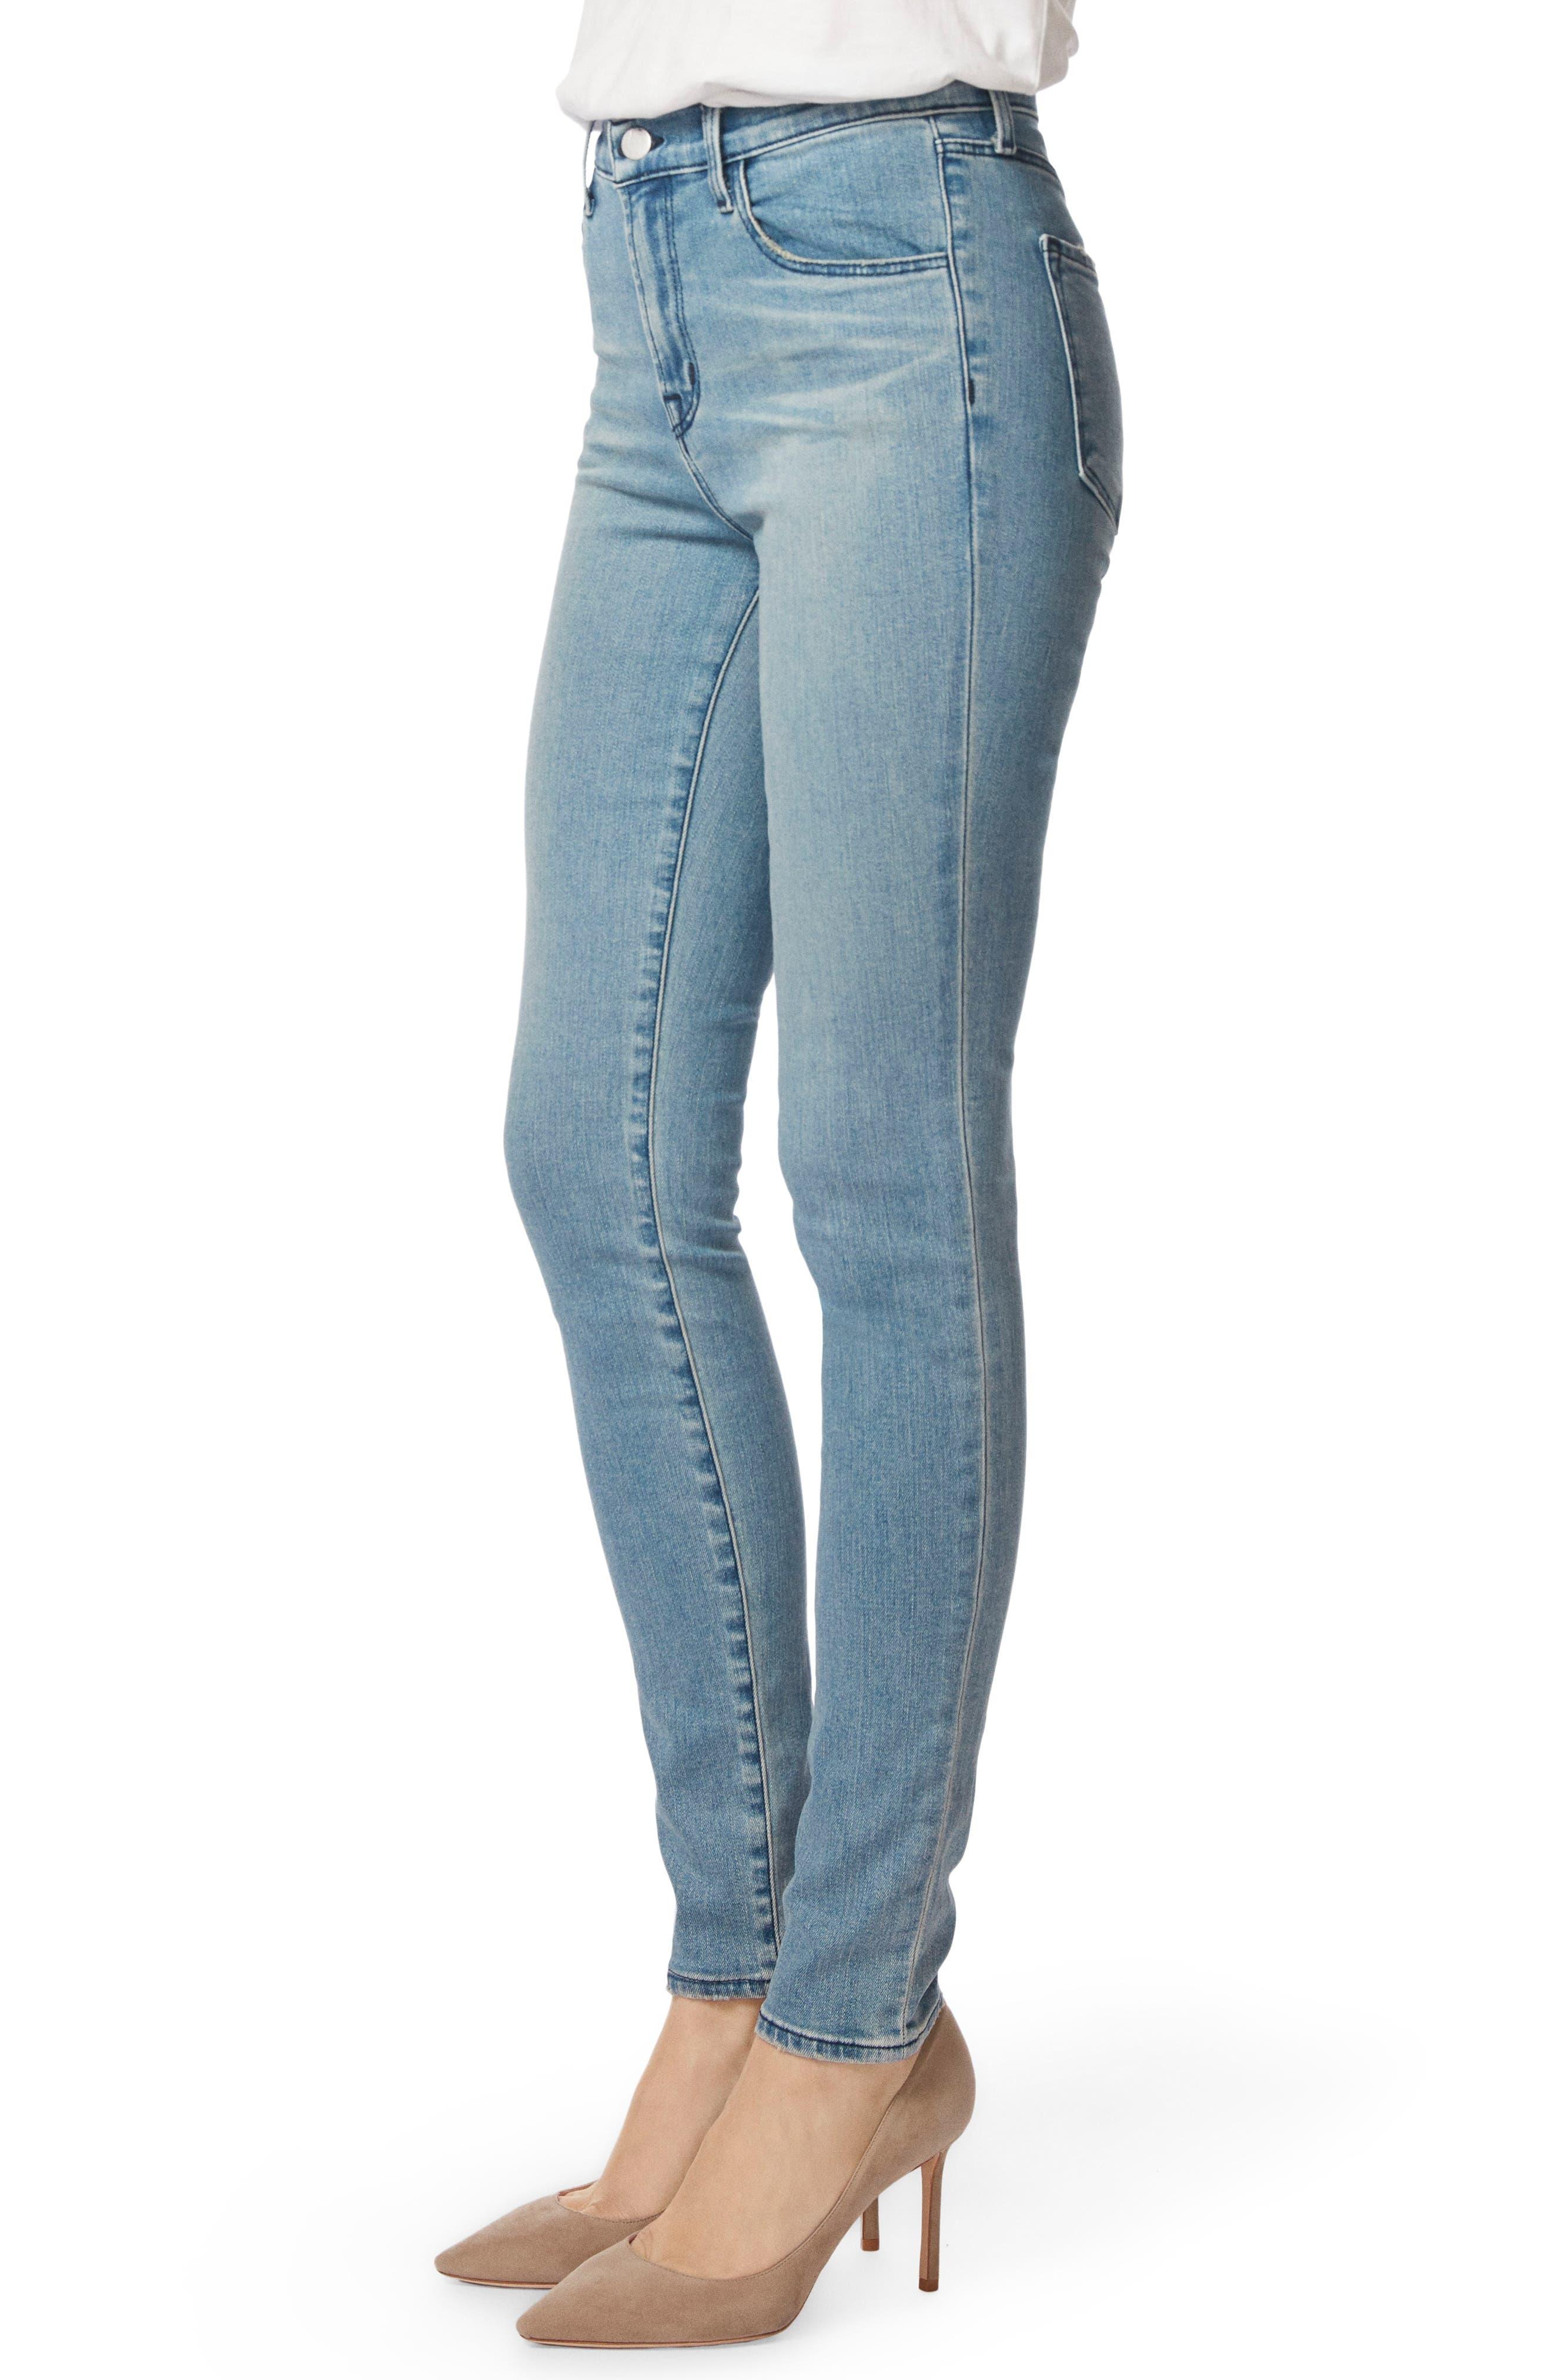 J BRAND, Maria High Waist Skinny Jeans, Alternate thumbnail 4, color, 407